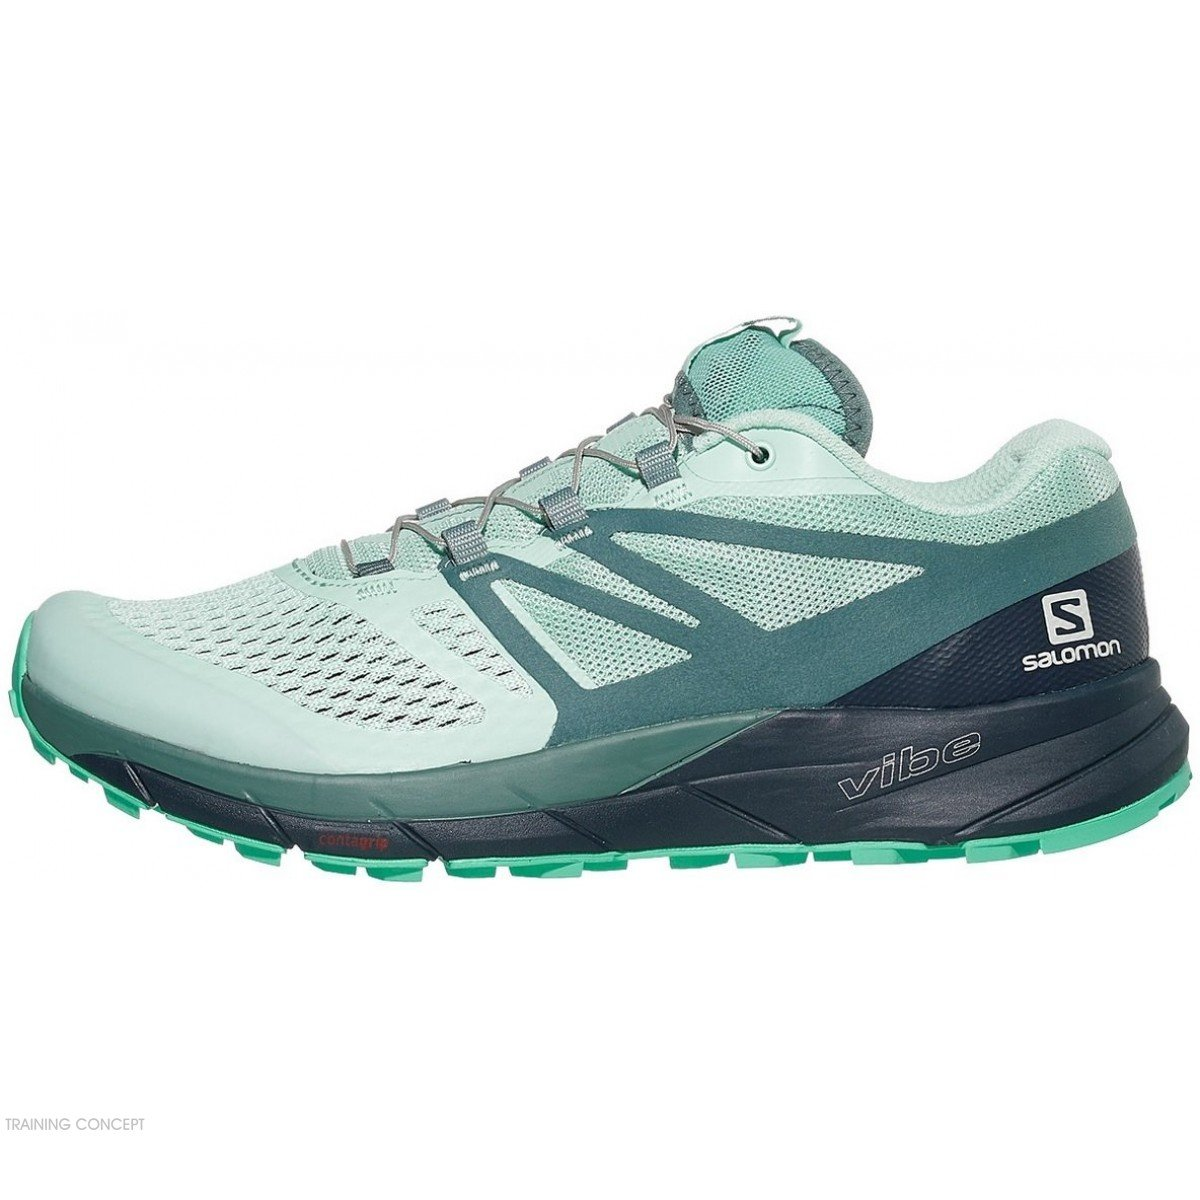 wholesale dealer 61d5e fee06 chaussures de trail running pour femmes salomon sense ride 2 406776 icy morn    navy blazer   electric green